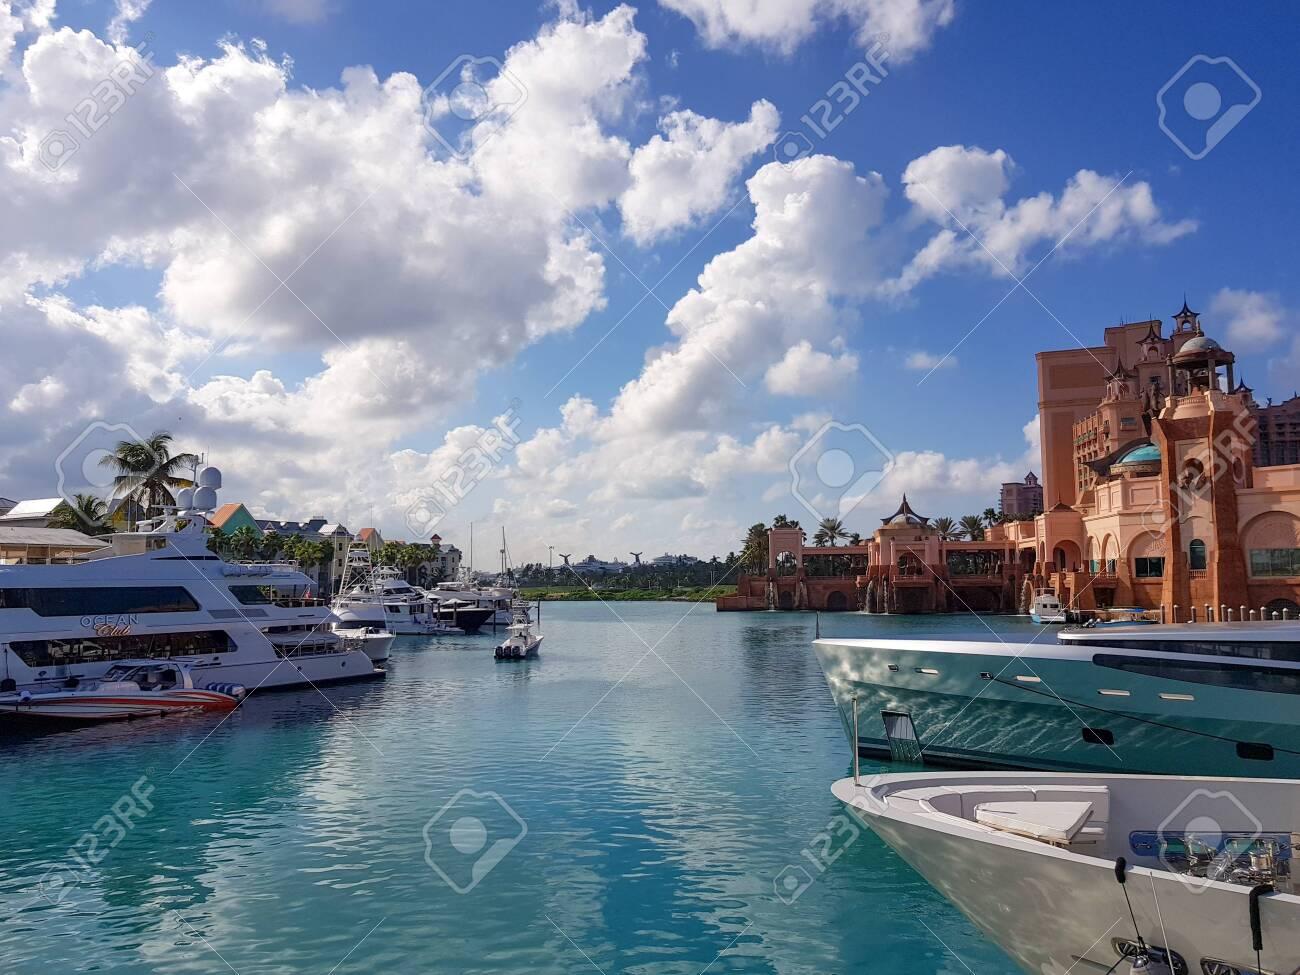 Atlantis Marina Paradise Island Bahamas 17 December 2017 View Of The Luxury Super Yachts Marina Next To The Famose Atlantis Hotel And Water Park Stock Photo Picture And Royalty Free Image Image 133363892